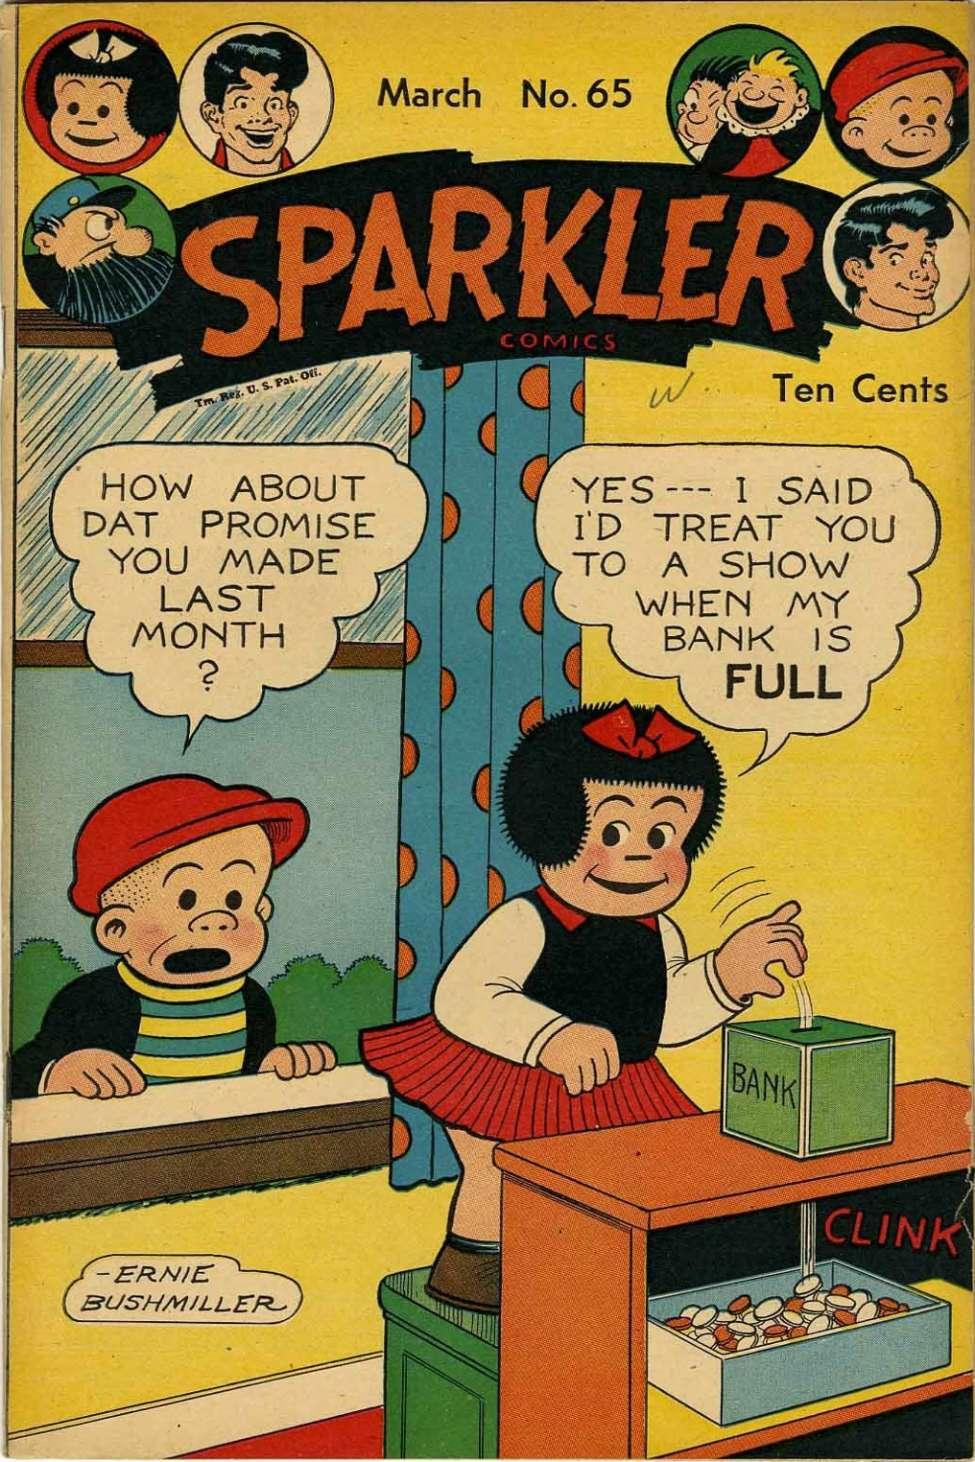 Comic Book Cover For Sparkler Comics v7 5 (65)